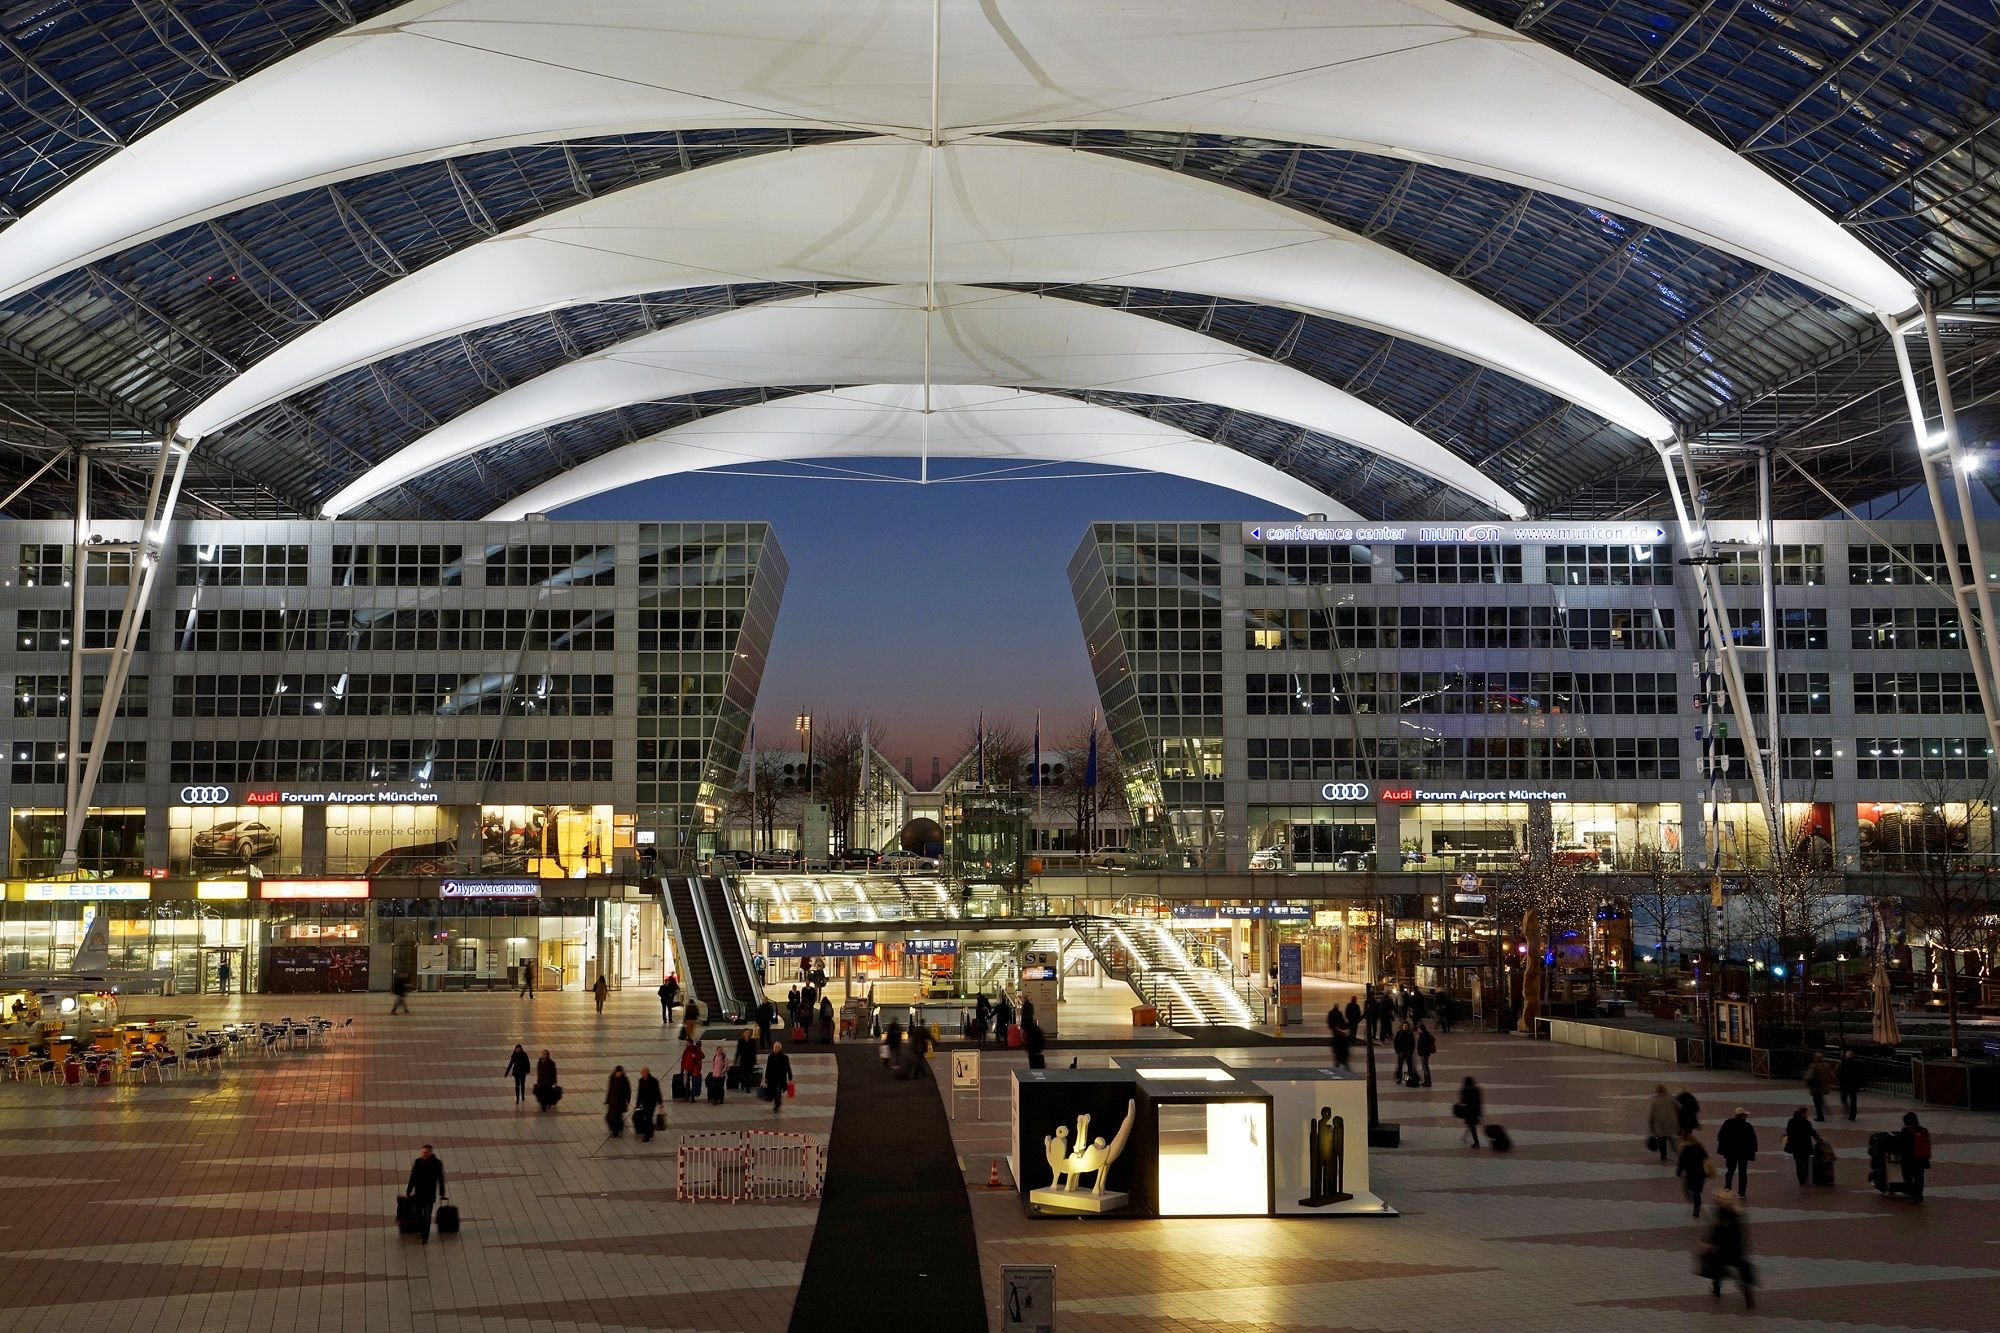 Munich Airport Flughafen Munchen Munich Airport Top 10